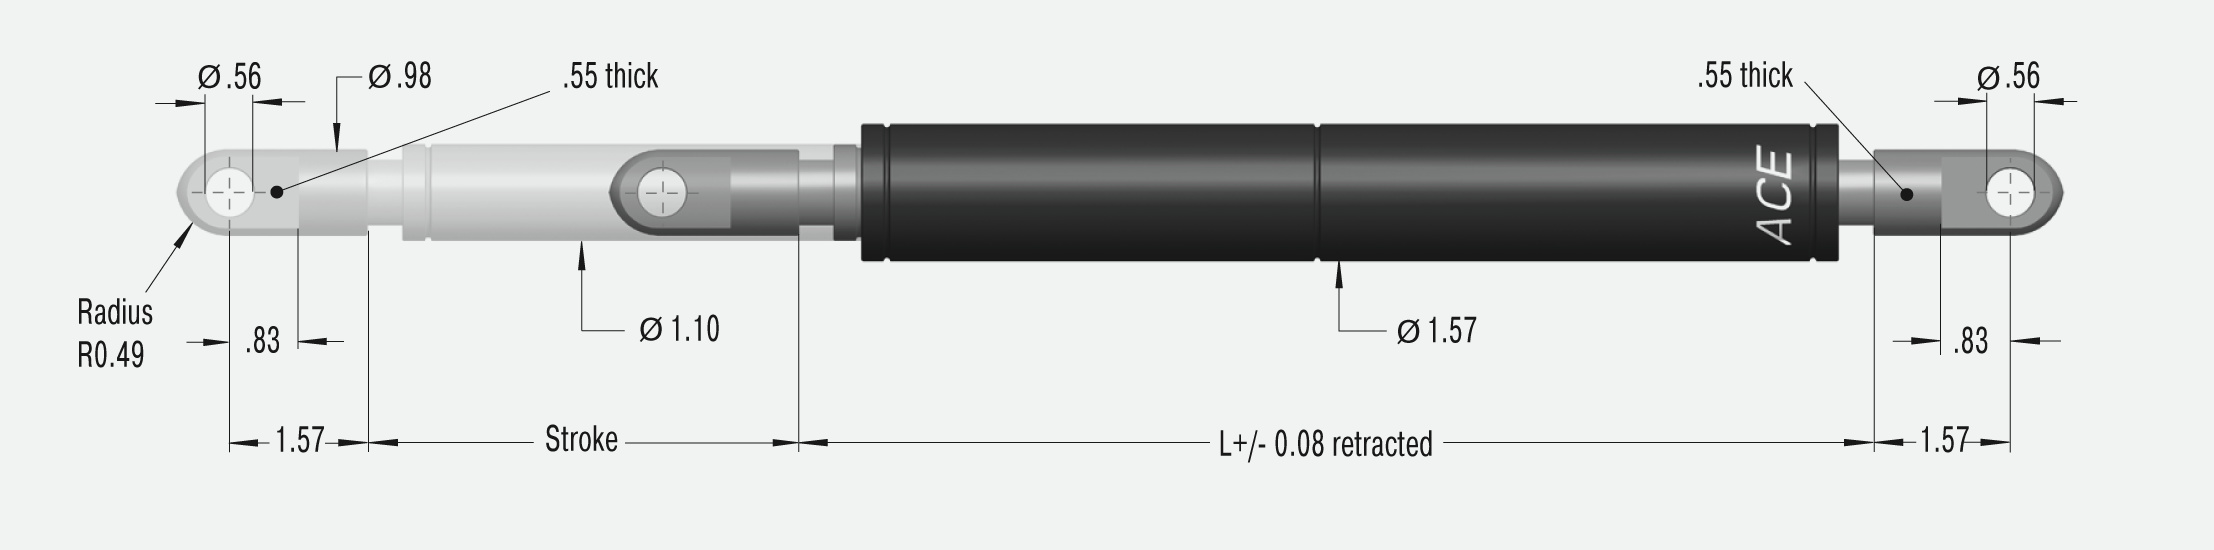 GZ-40-400